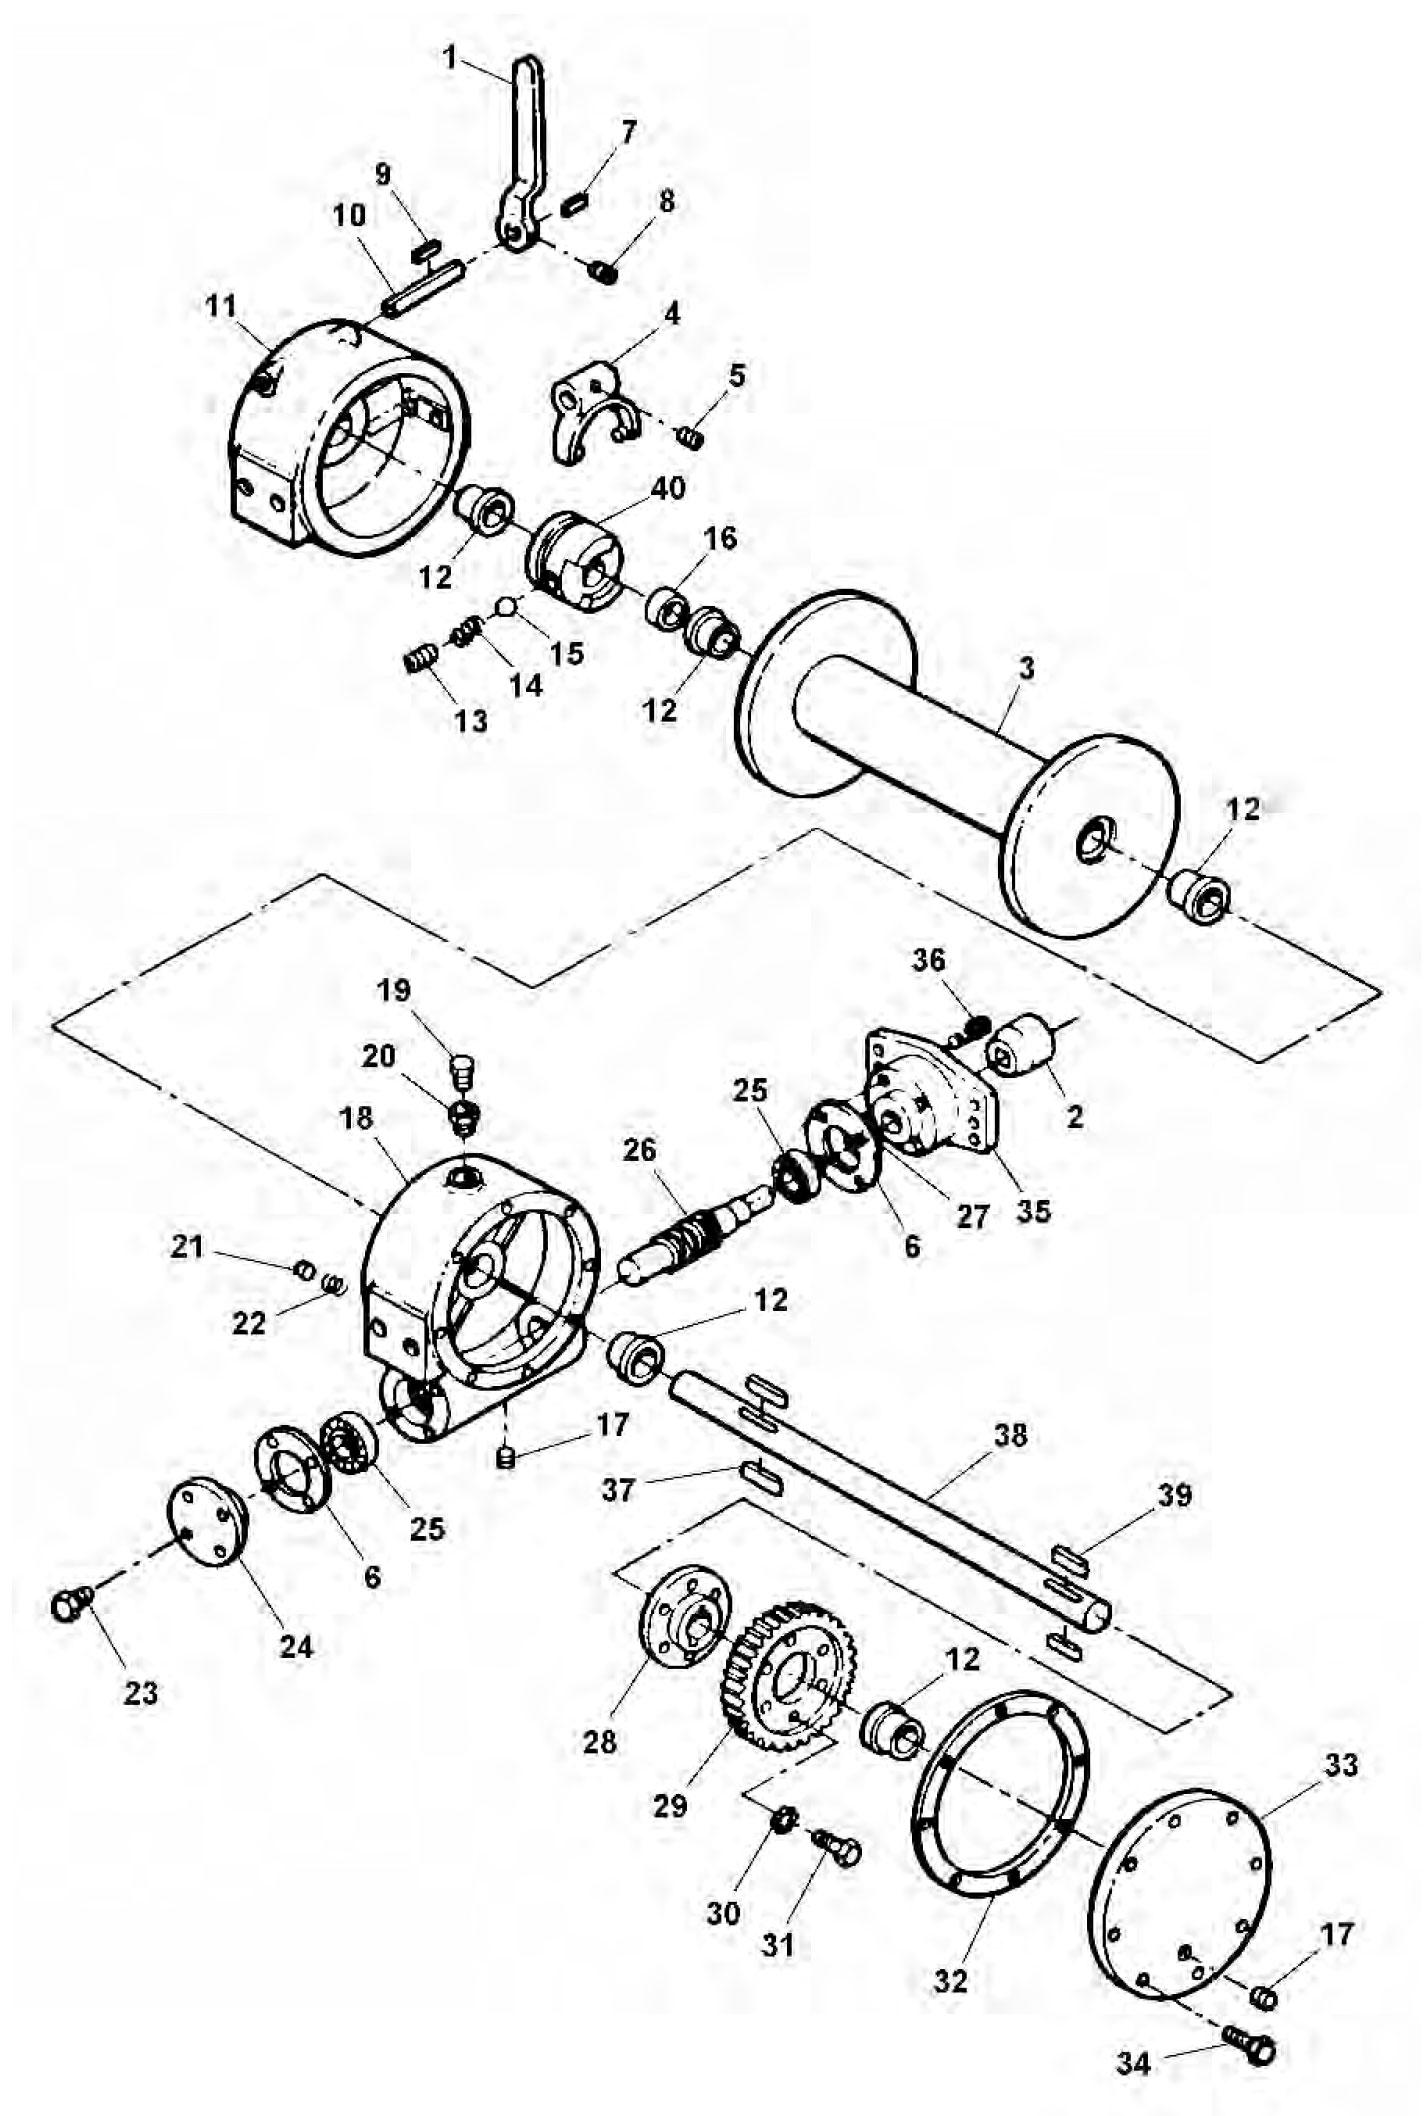 For Ramsey 12 000 Lb Winch Wiring Diagram. 10 000 Lb Hyd ... on